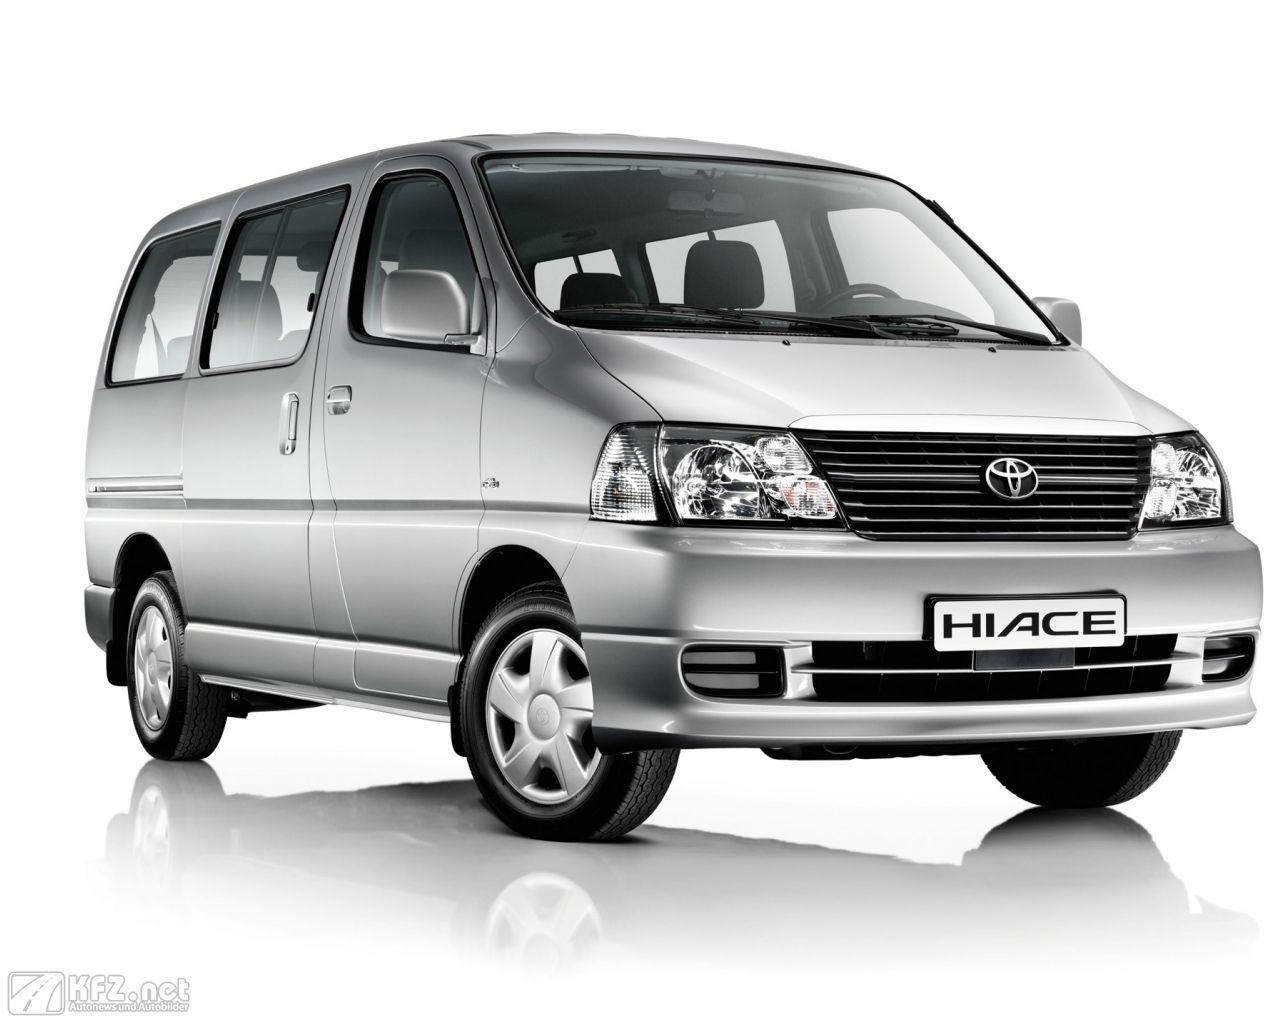 toyota-hiace-1280x1024-1